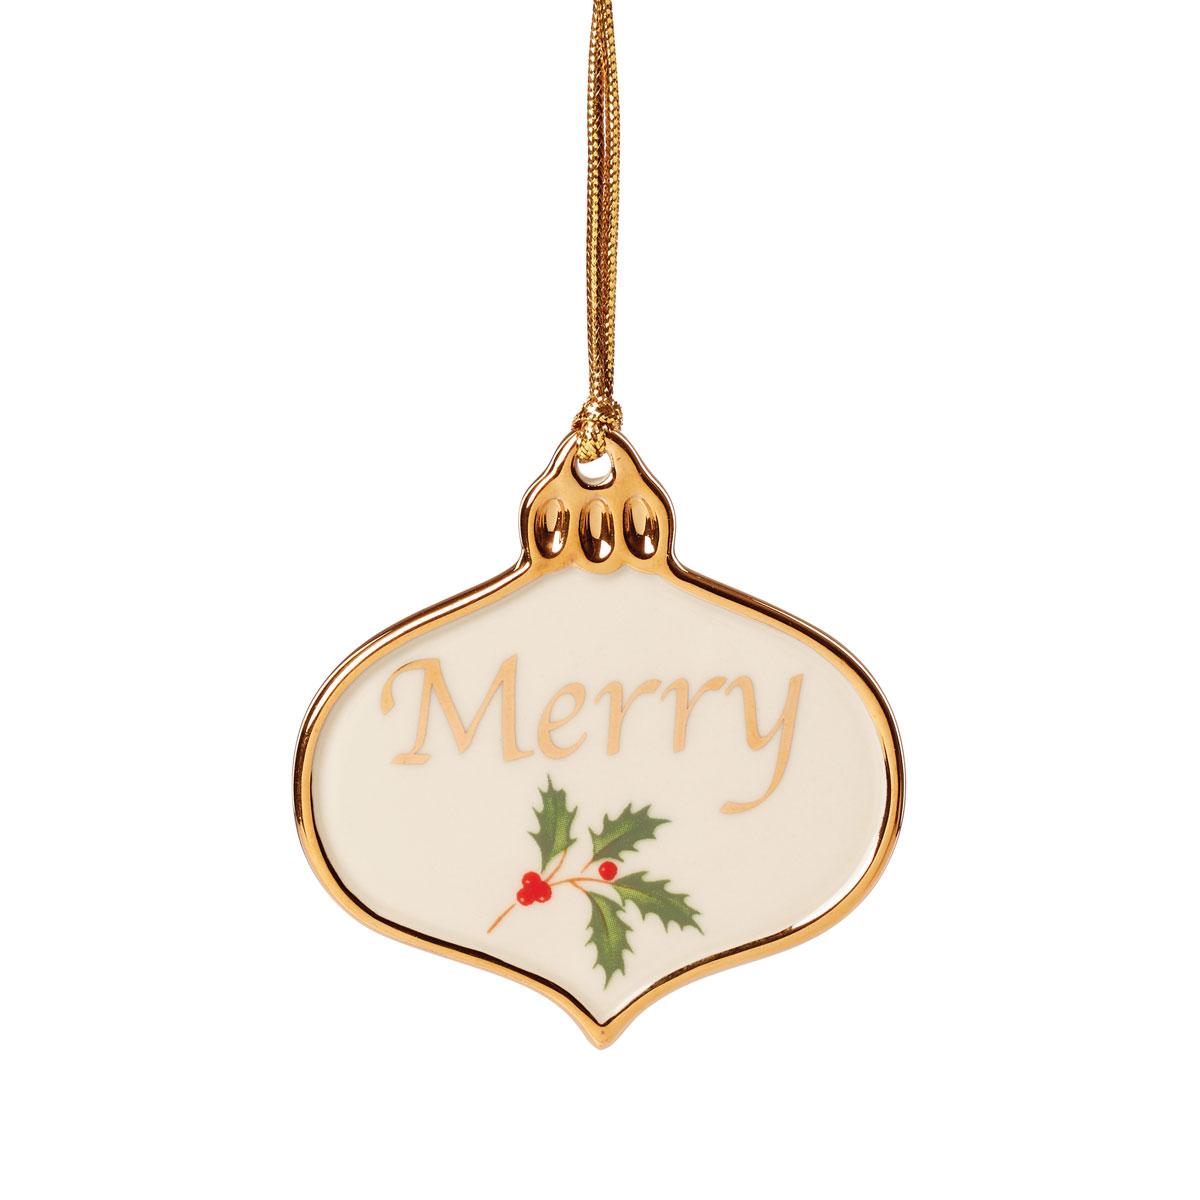 Lenox 2021 Holiday Sentiment Ornament Charm Merry